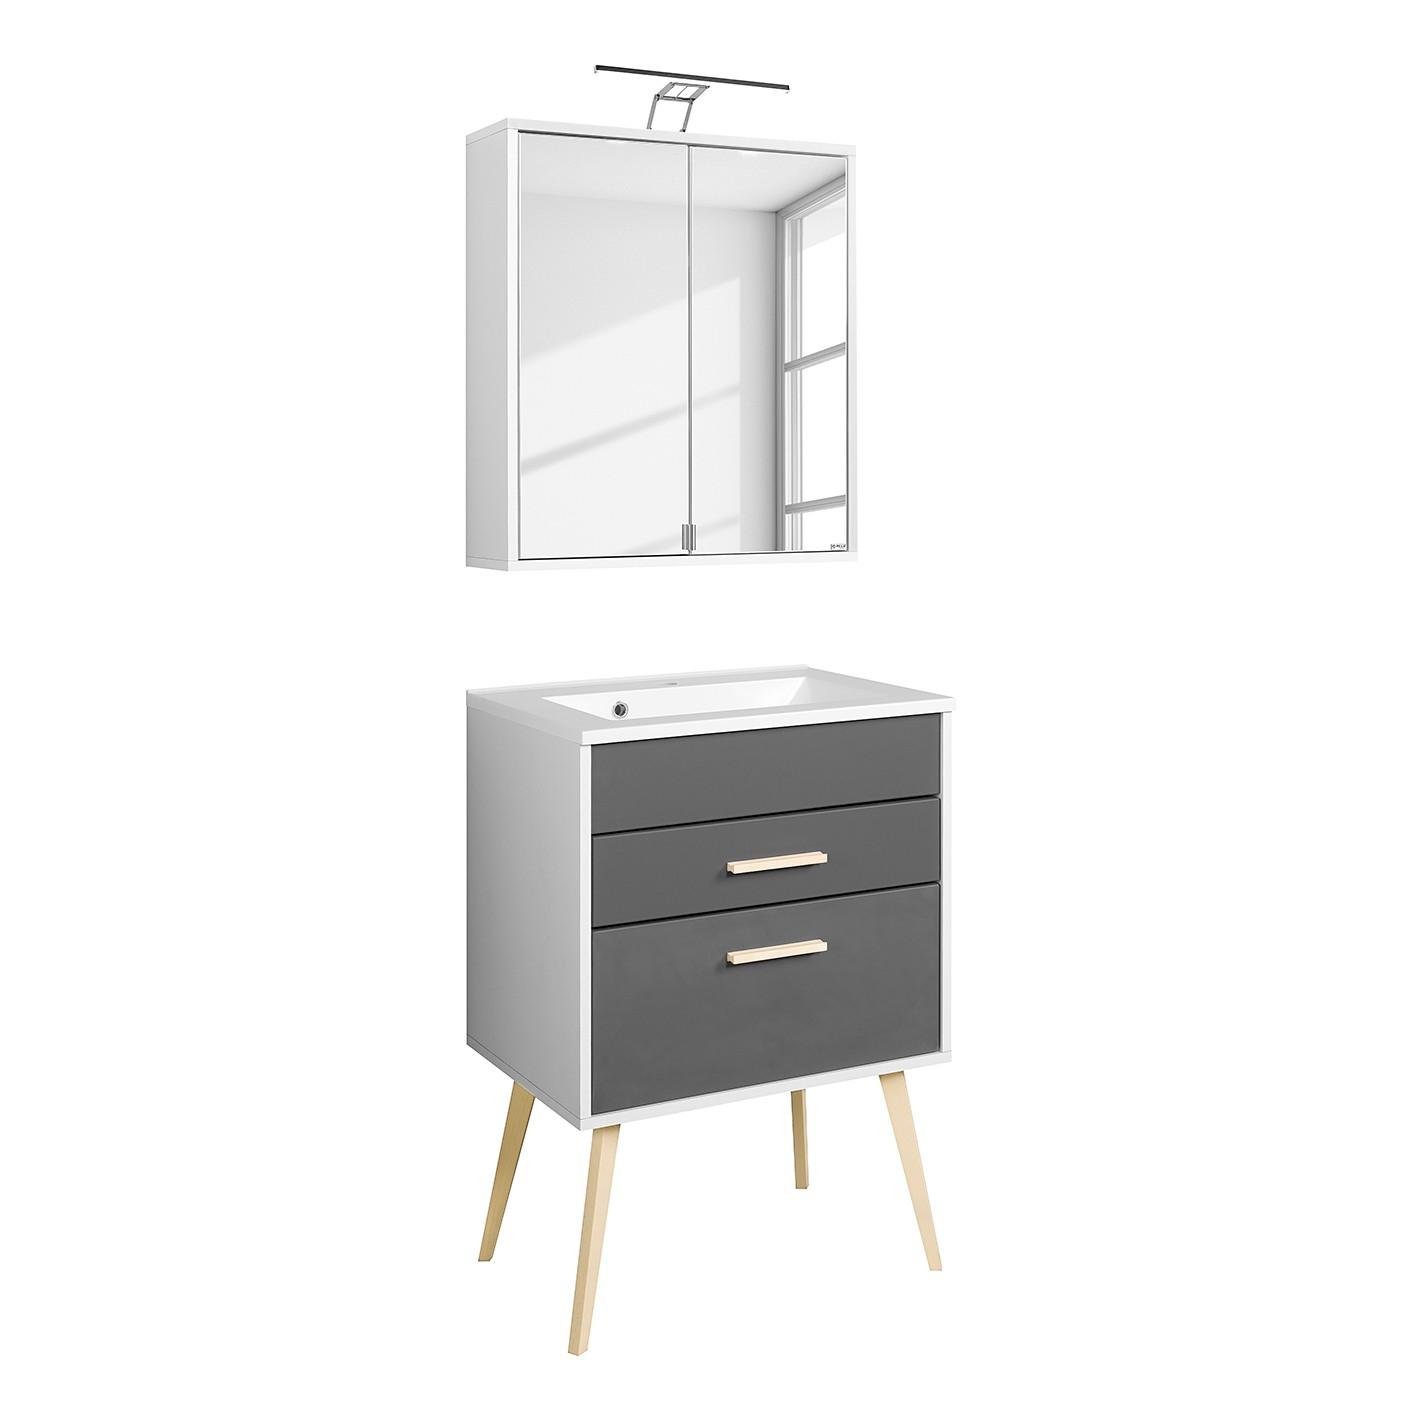 Designer Möbel Trends   Giessbach EEK A+, Badezimmerset Oslo (2 ...